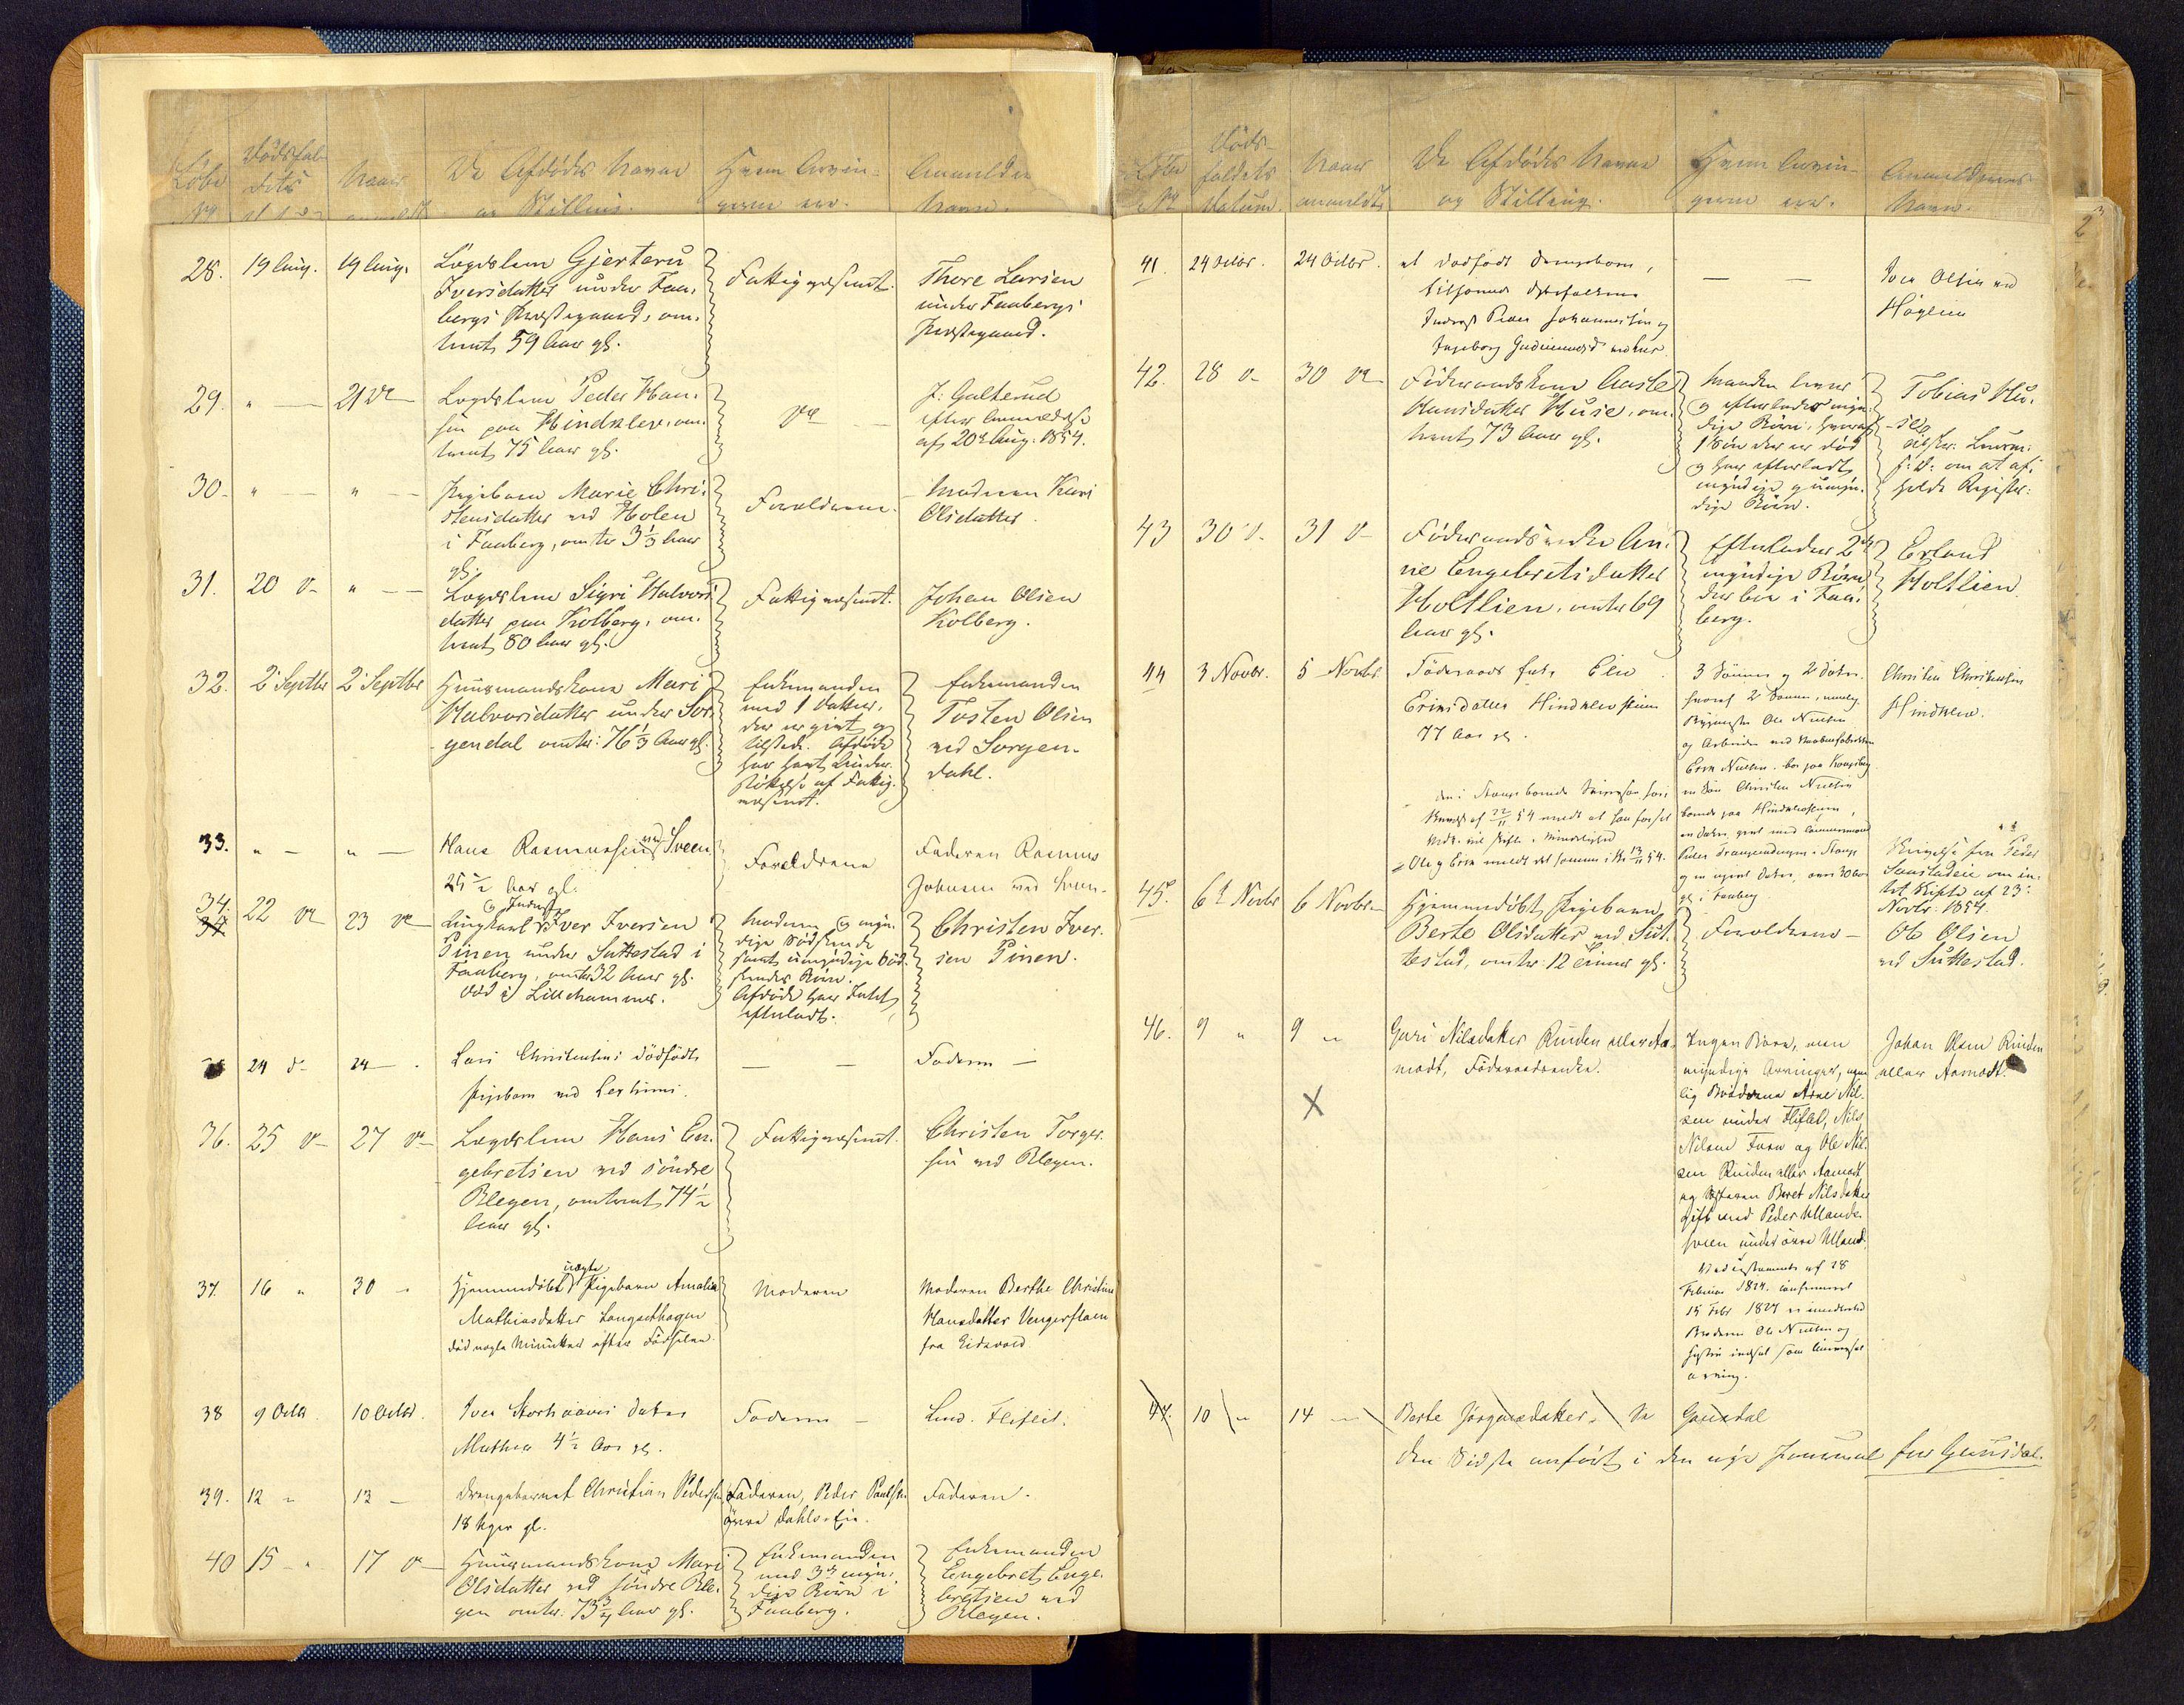 SAH, Sør-Gudbrandsdal tingrett, J/Jd/Jda/L0002: Dødsfallsprotokoll - Fåberg og Gausdal, 1851-1893